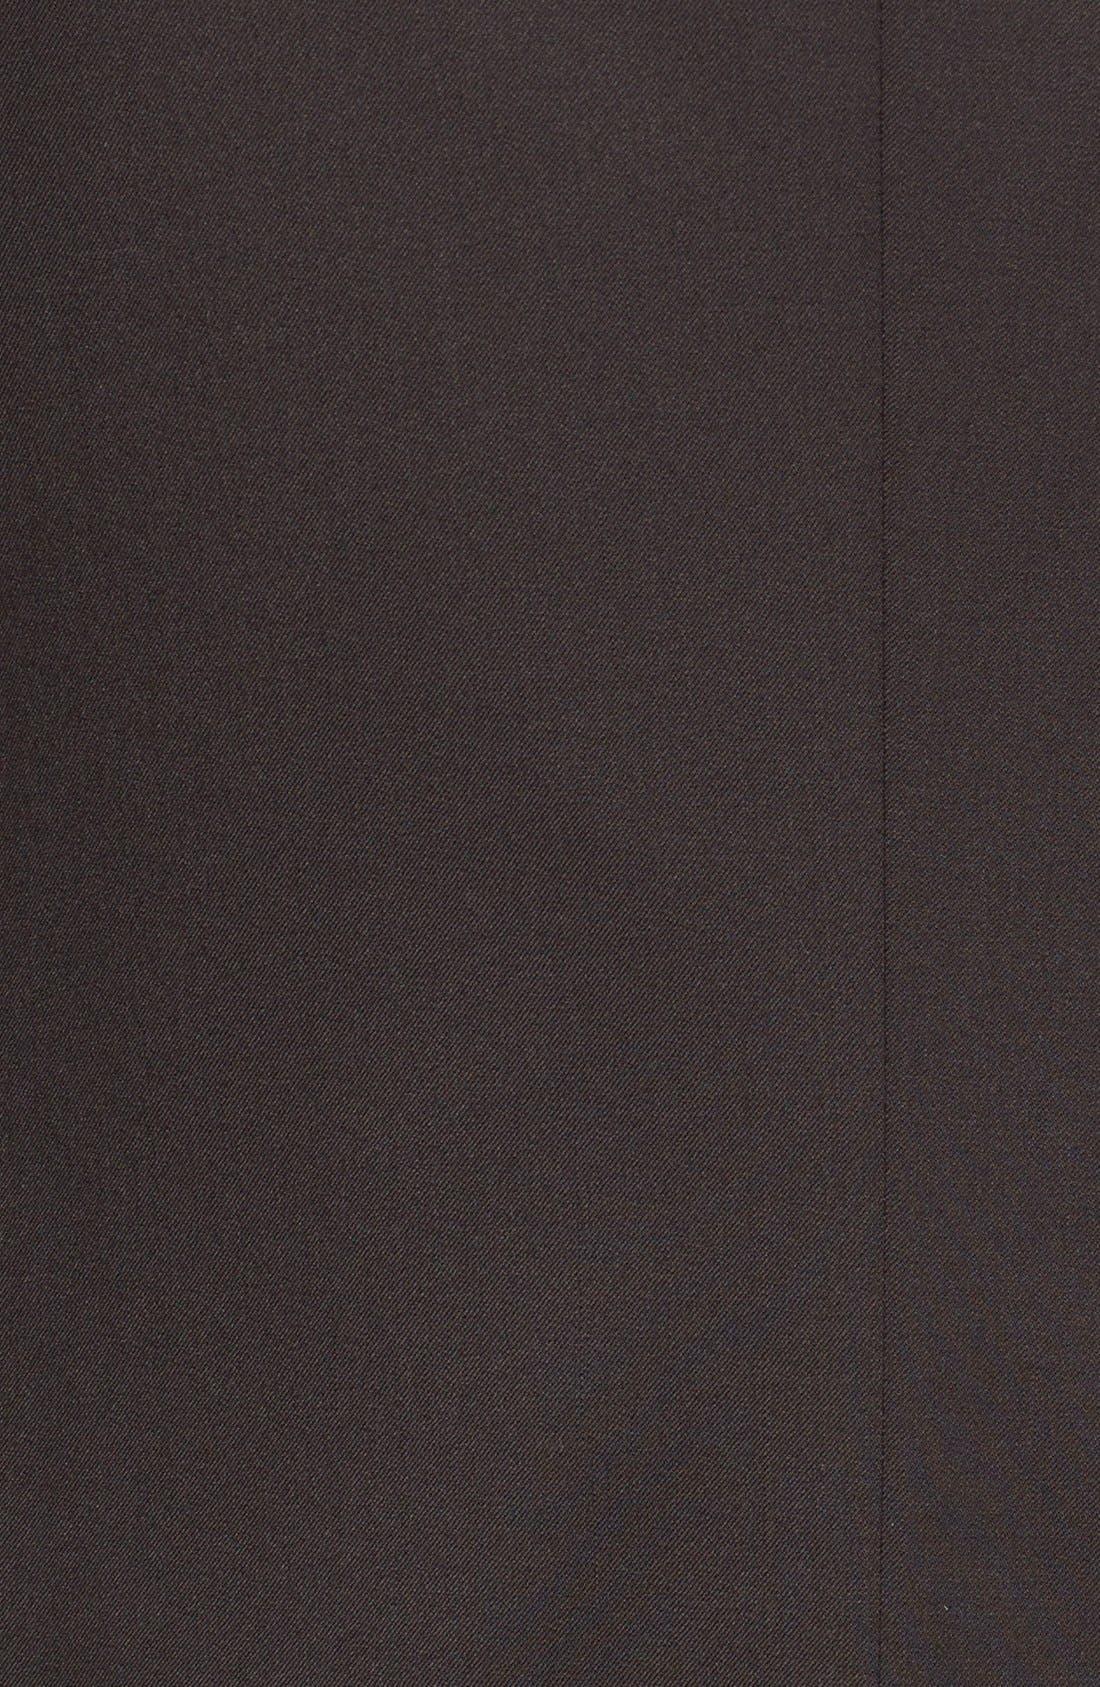 Trim Fit Wool Tuxedo,                             Alternate thumbnail 7, color,                             BLACK